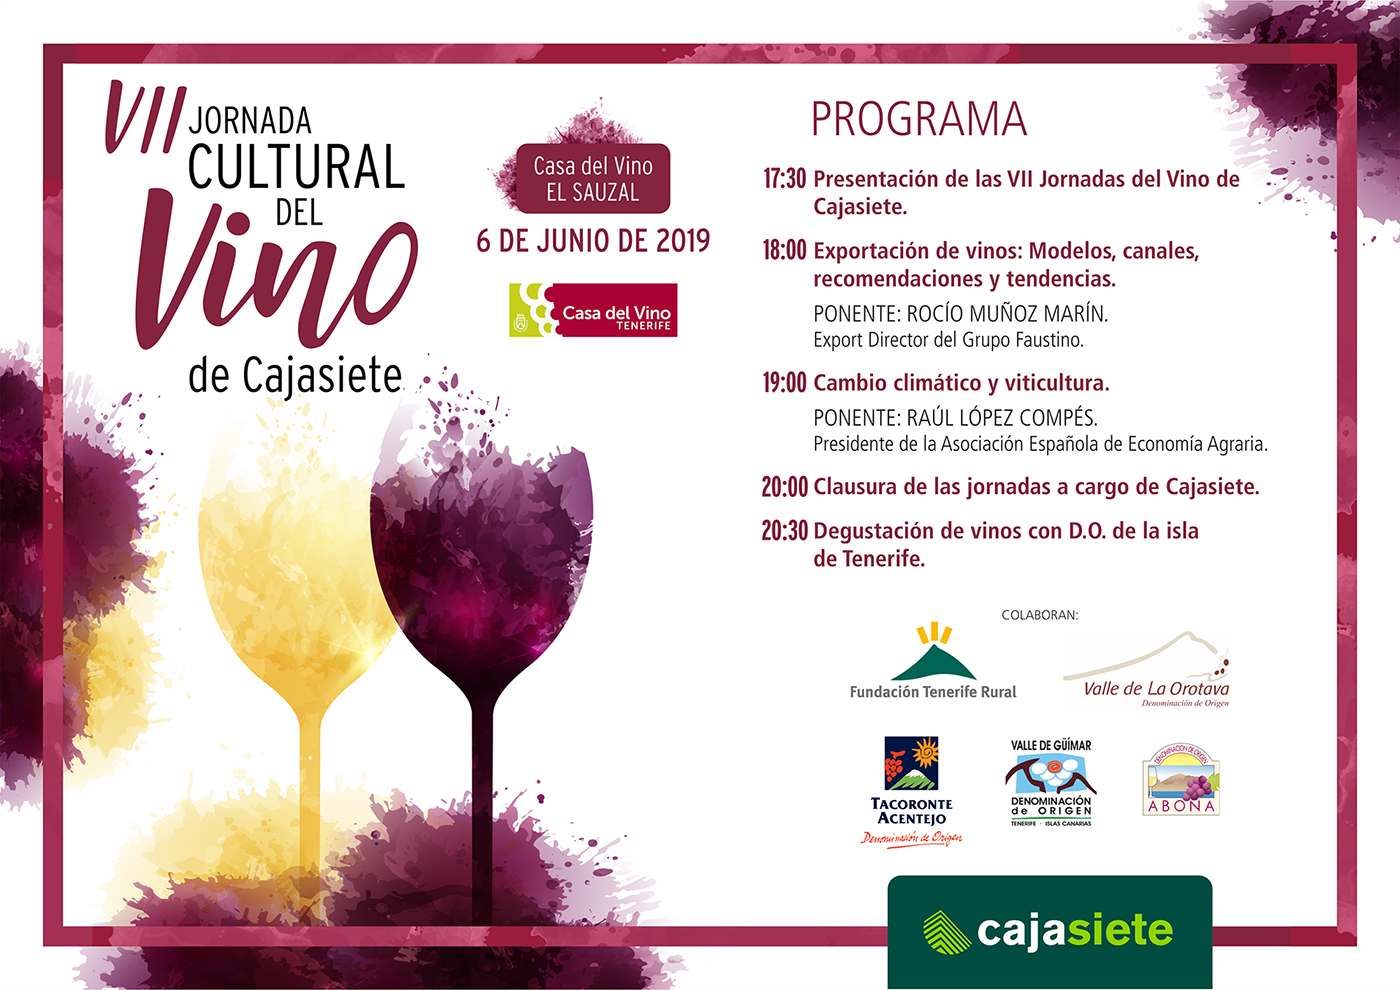 VII Jornada Cultural del Vino de Cajasiete